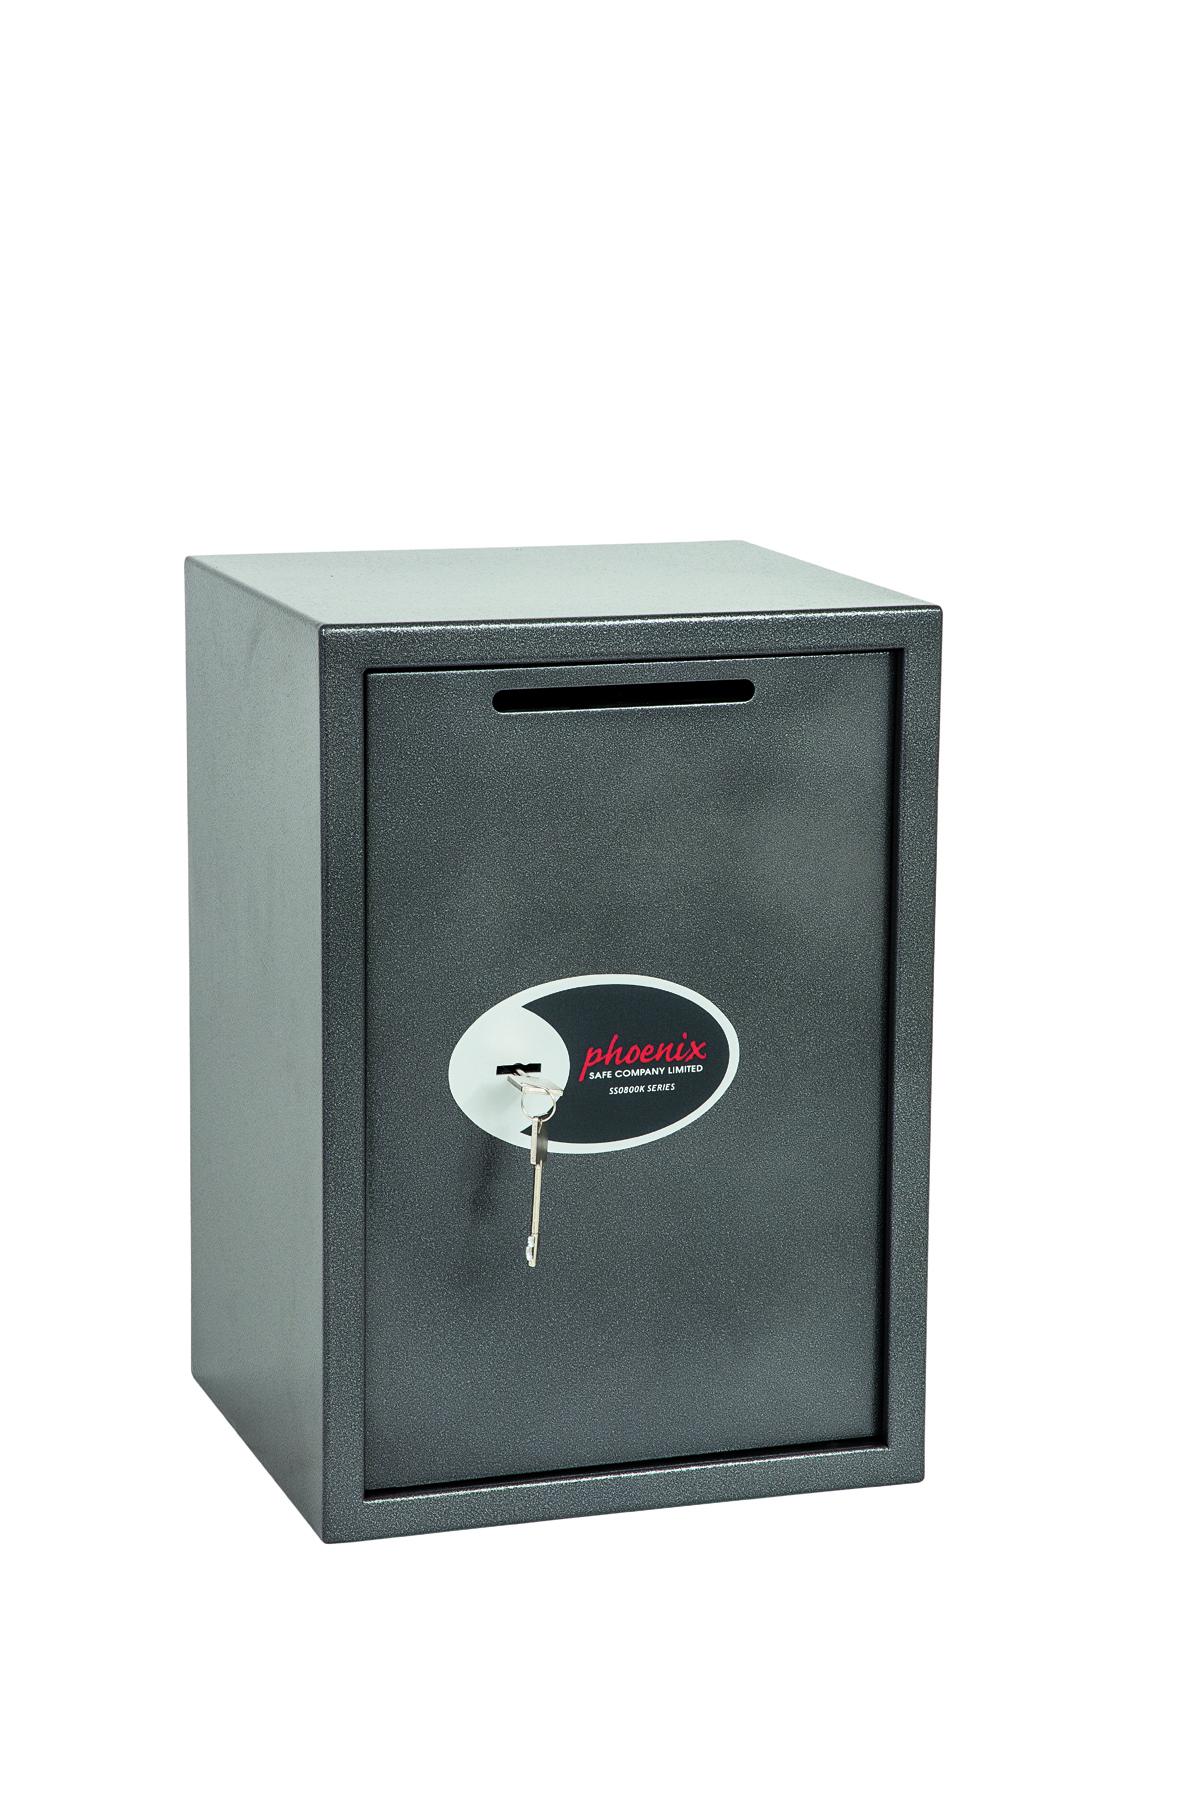 Phoenix Vela Deposit Home and Office Size 4 Safe Key Lock Graphite Grey SS0804KD